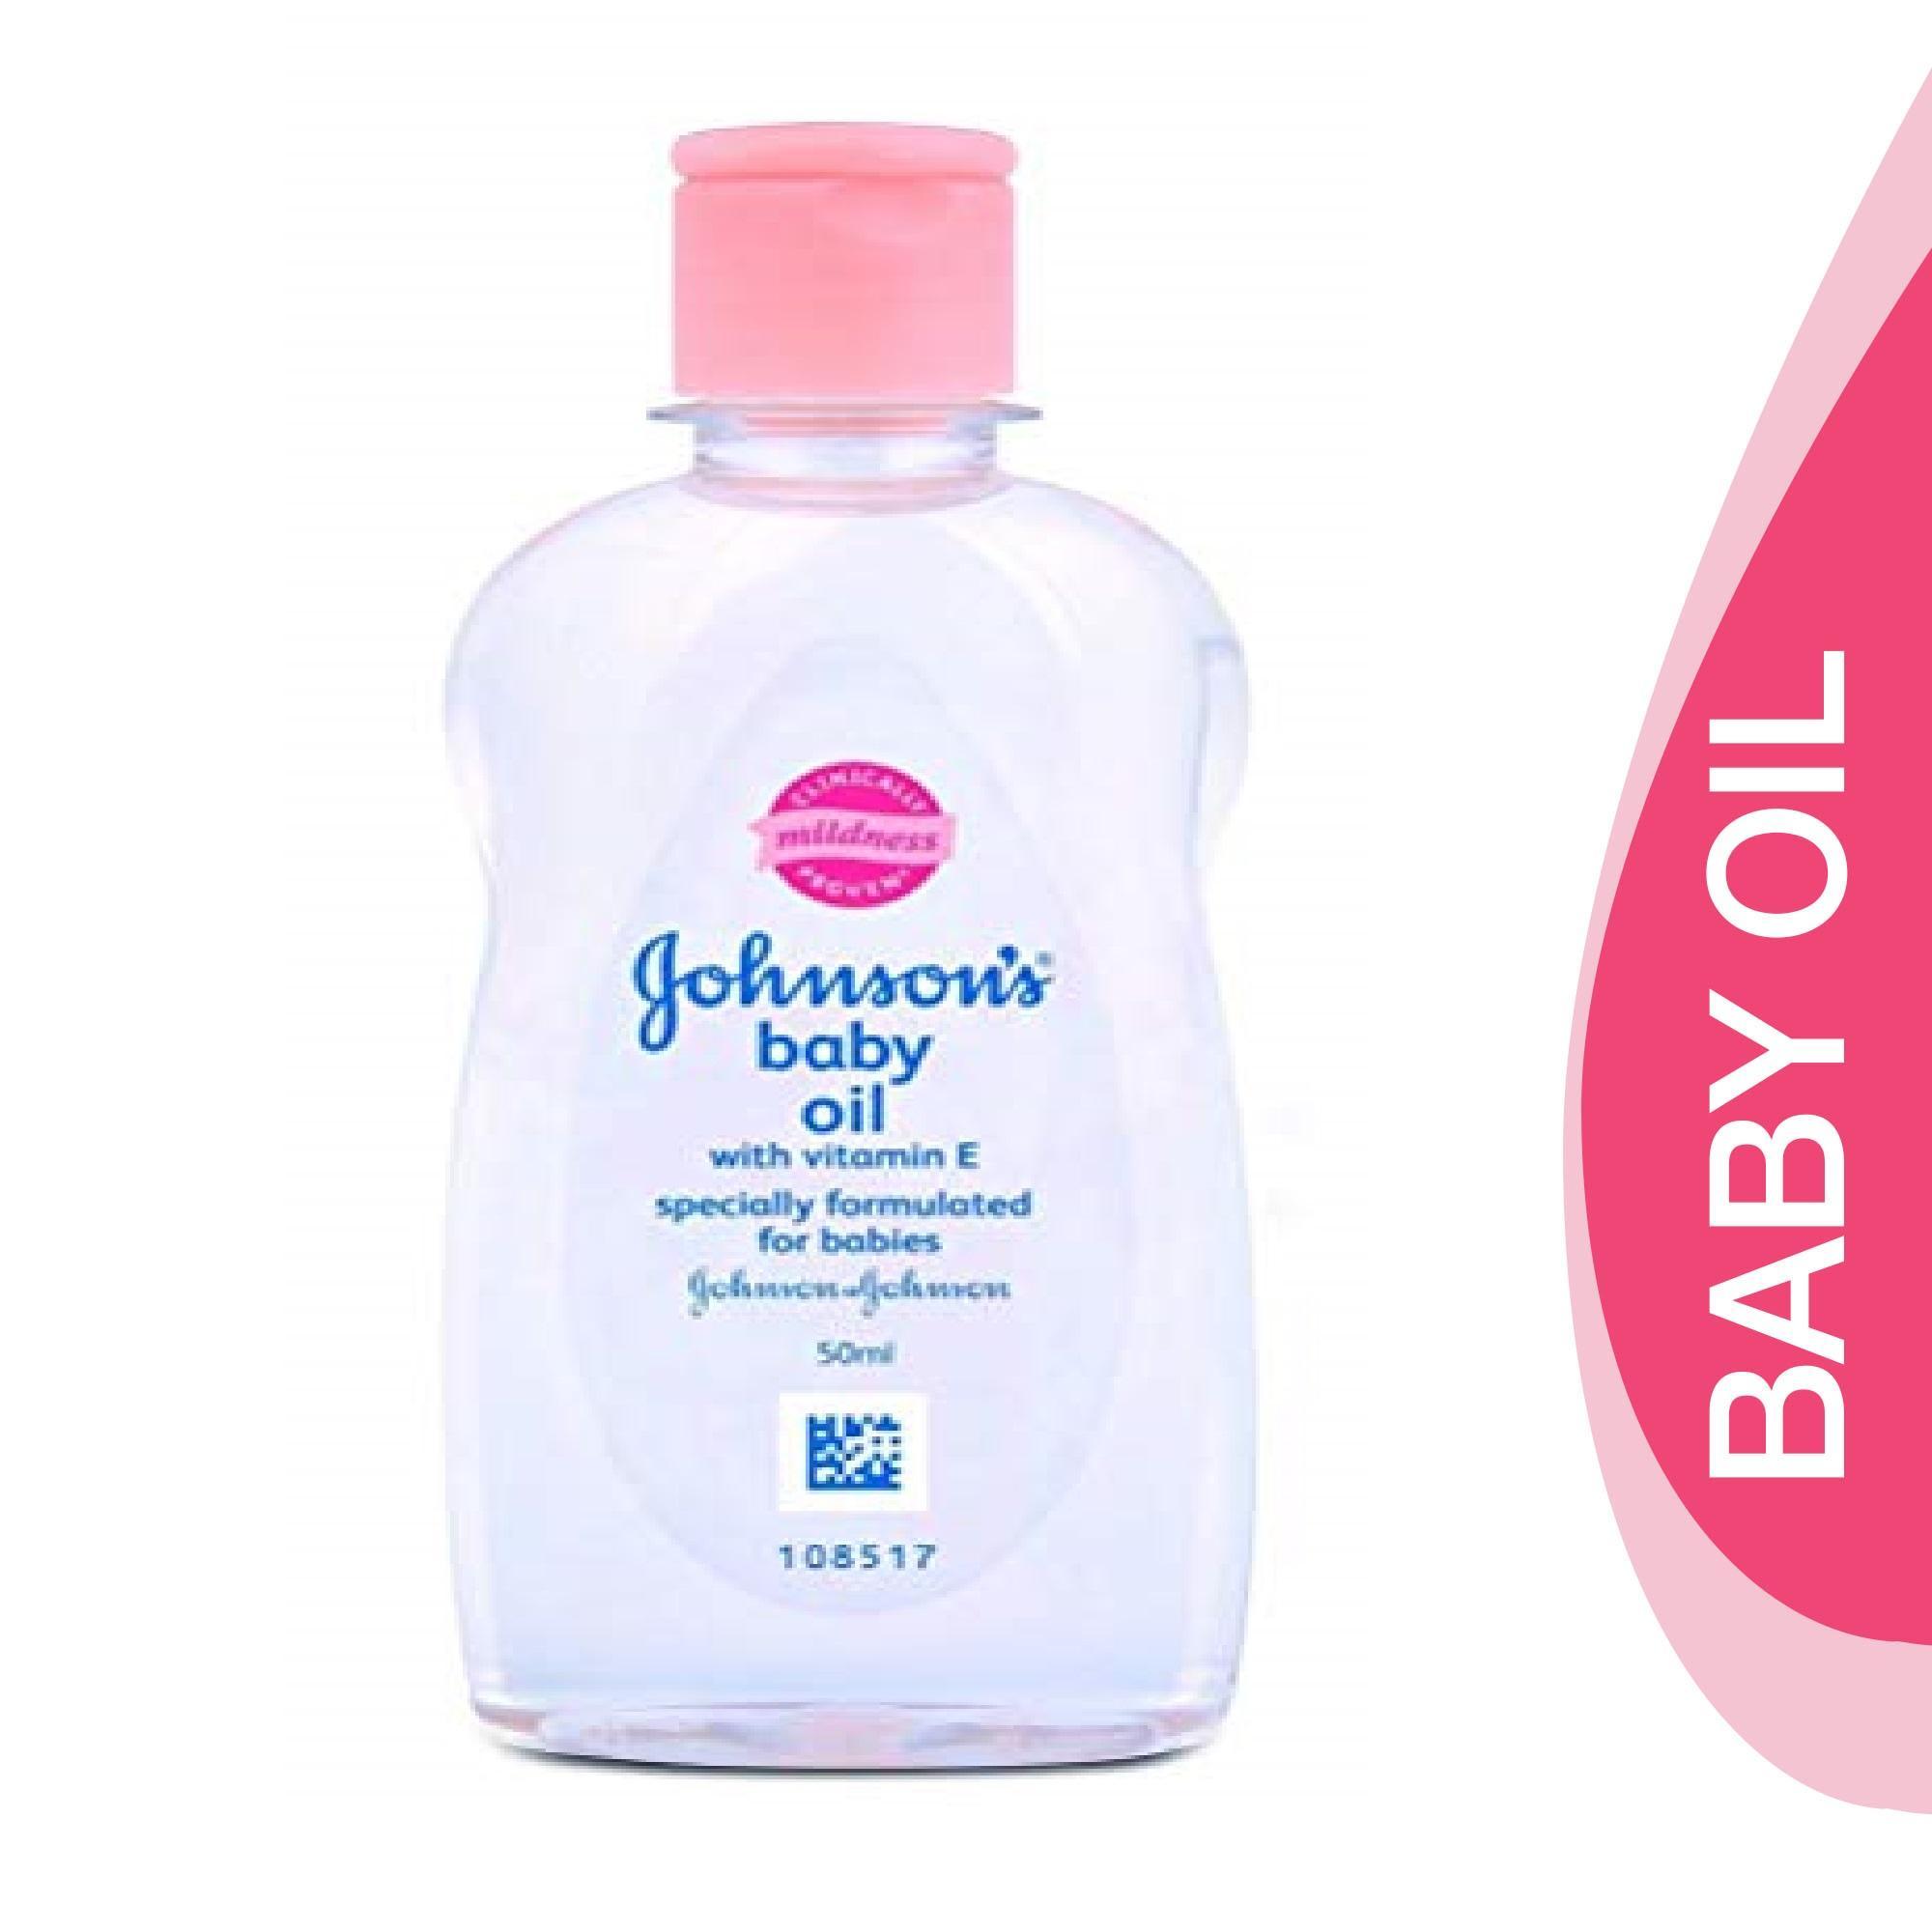 9b33b8b82 Baby Oils - Buy Baby Oils at Best Price in Pakistan | www.daraz.pk